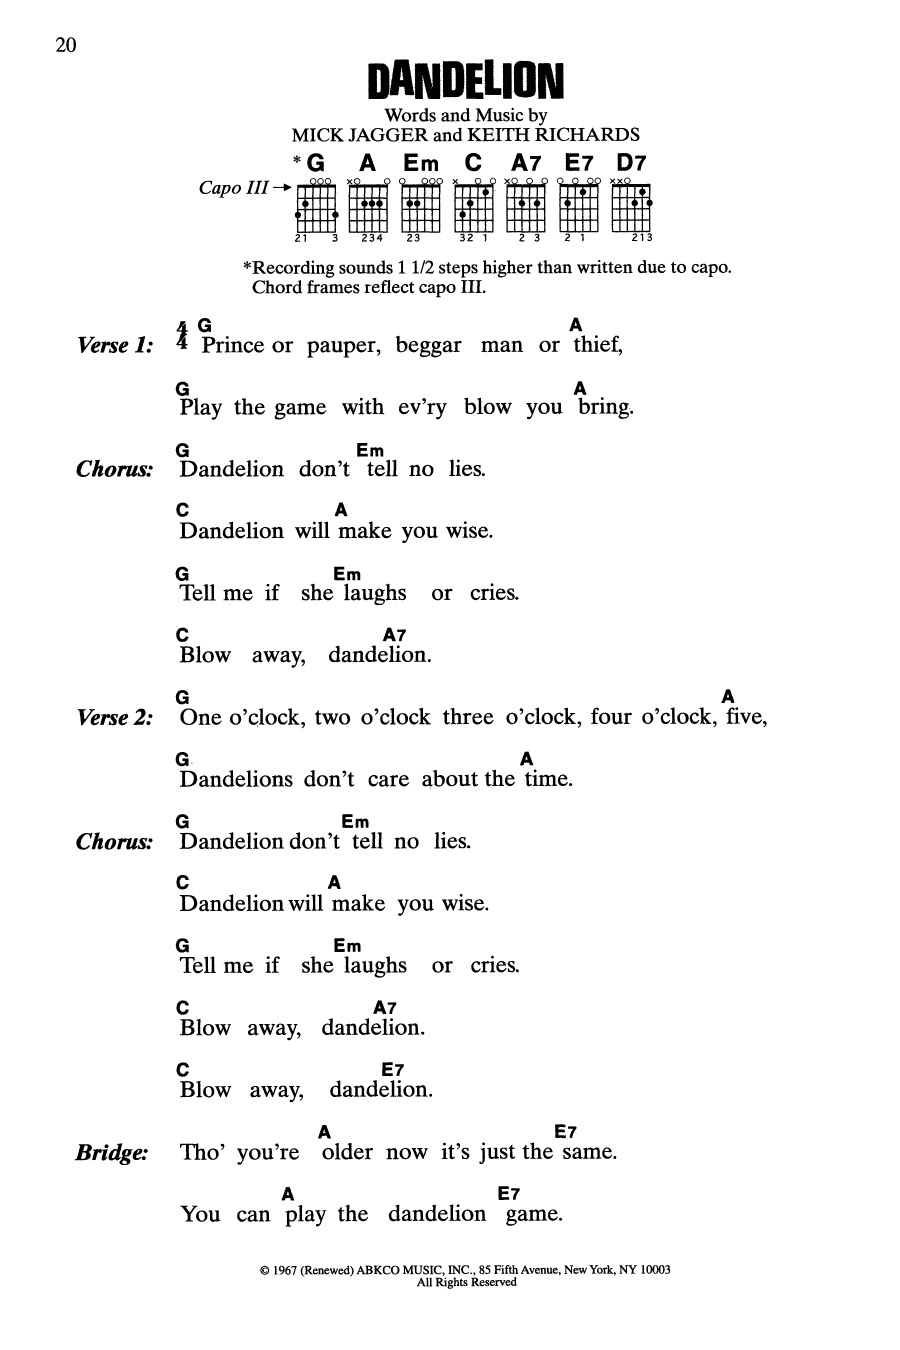 Dandelion (Guitar Chords/Lyrics)